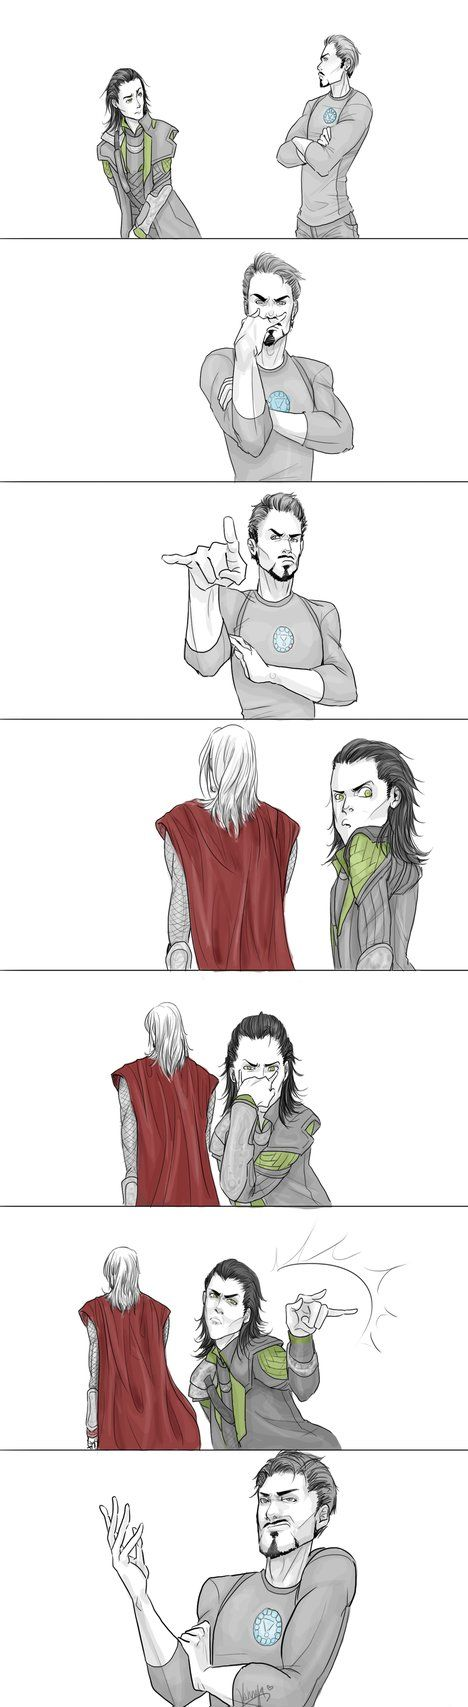 bahahahahahaha this is brilliant!!!!! Mash up of Avengers and Korra!!